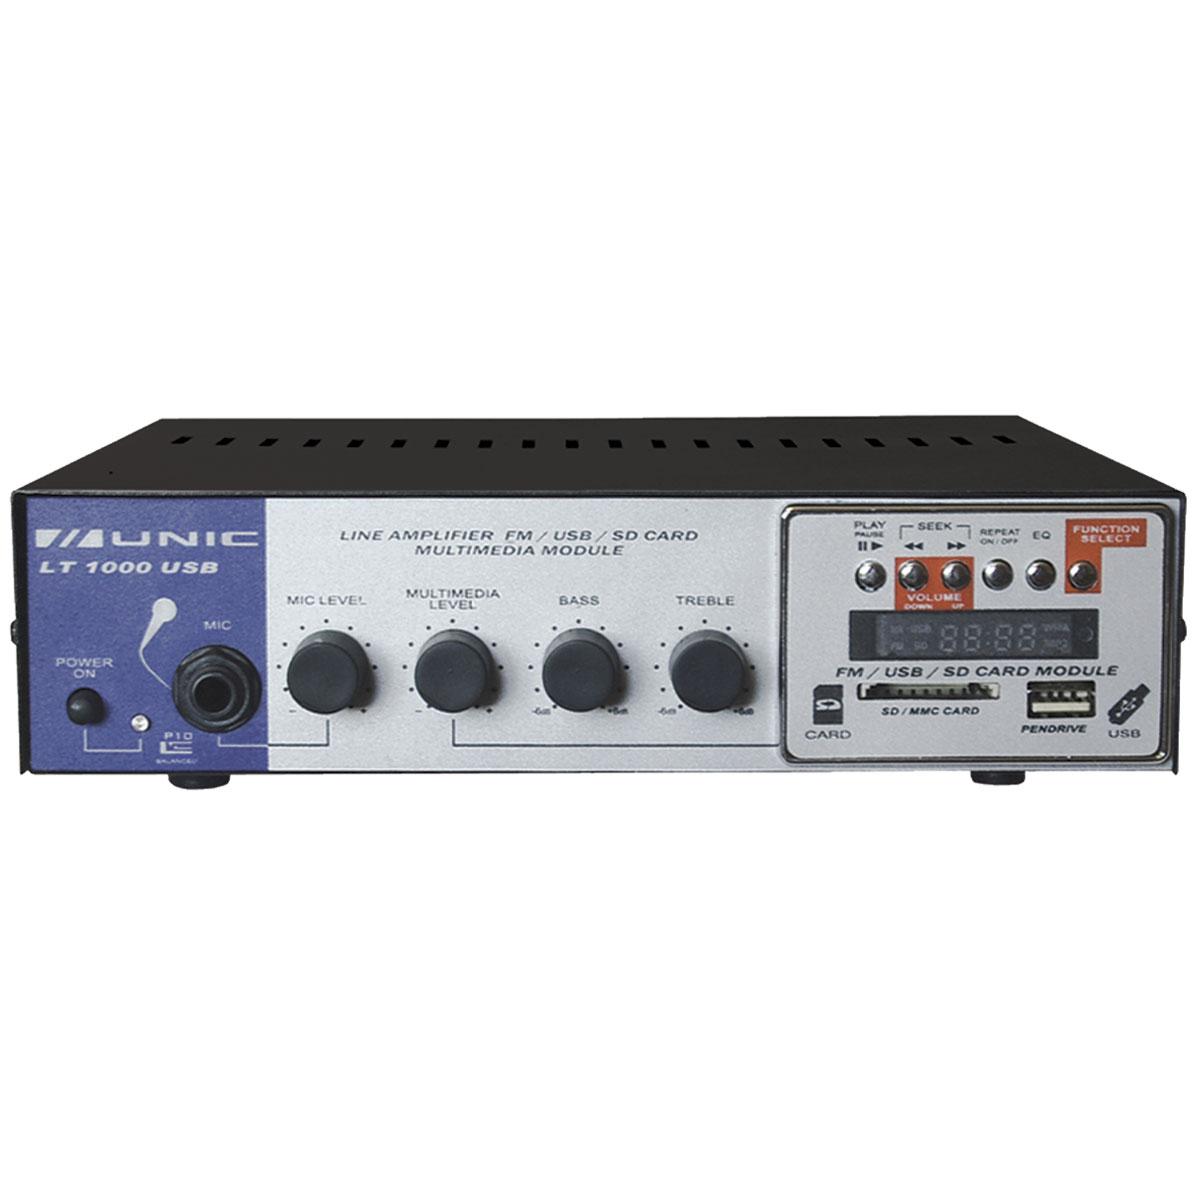 Amplificador Som Ambiente 20W c/ USB e FM LT 1000 USB - Unic